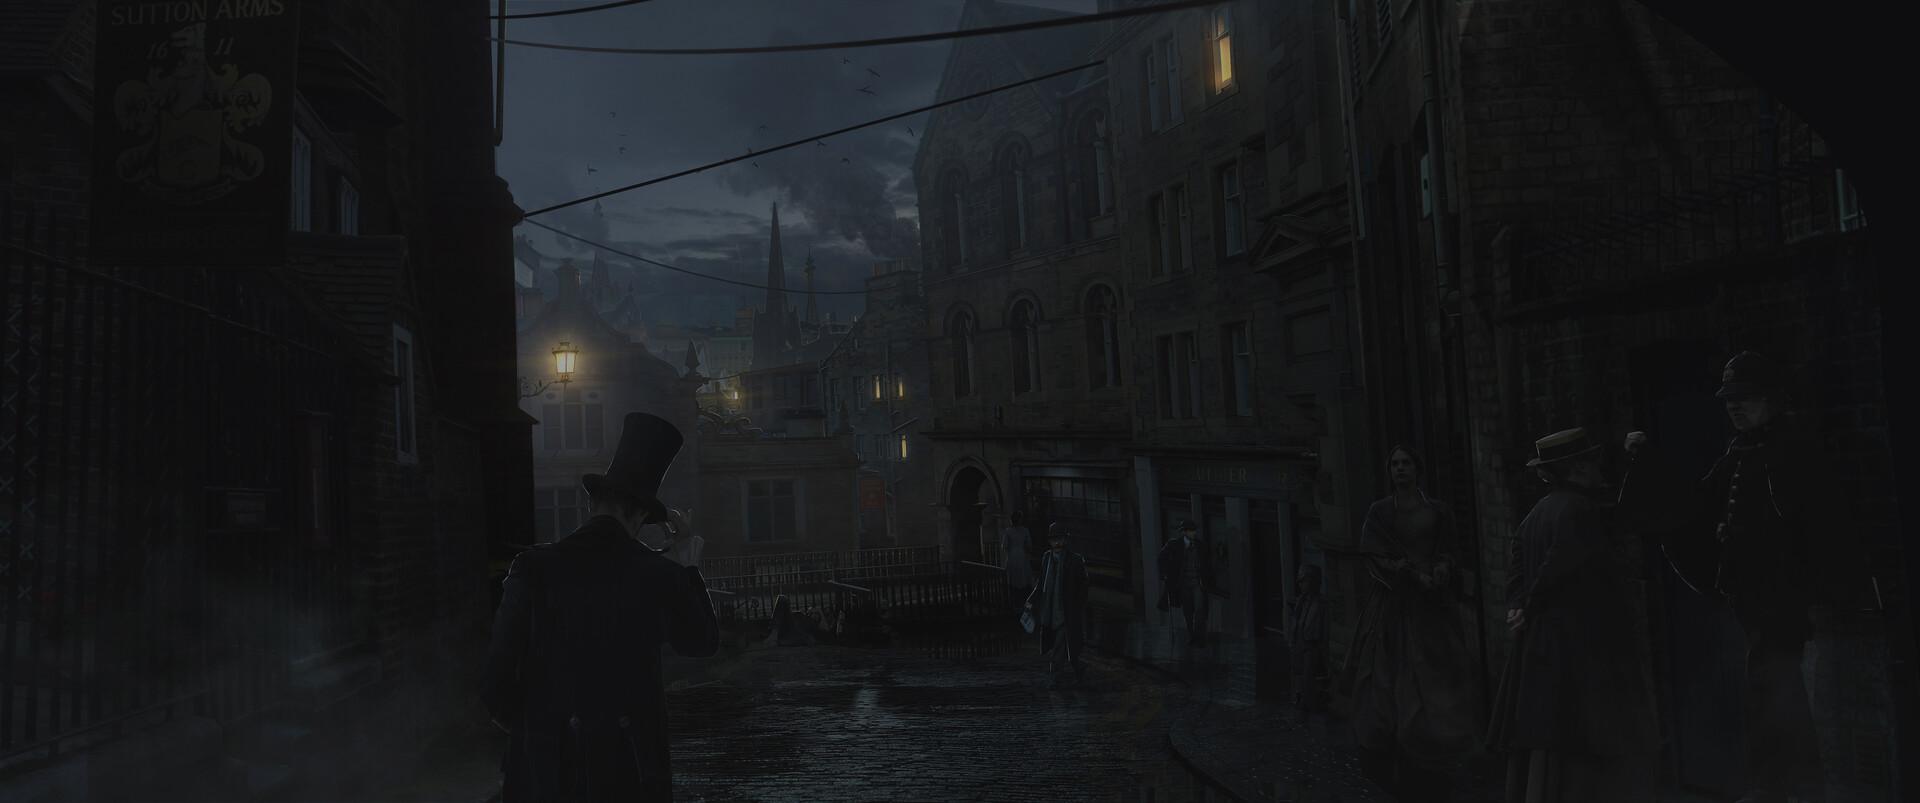 Michael morris whitechapel street2